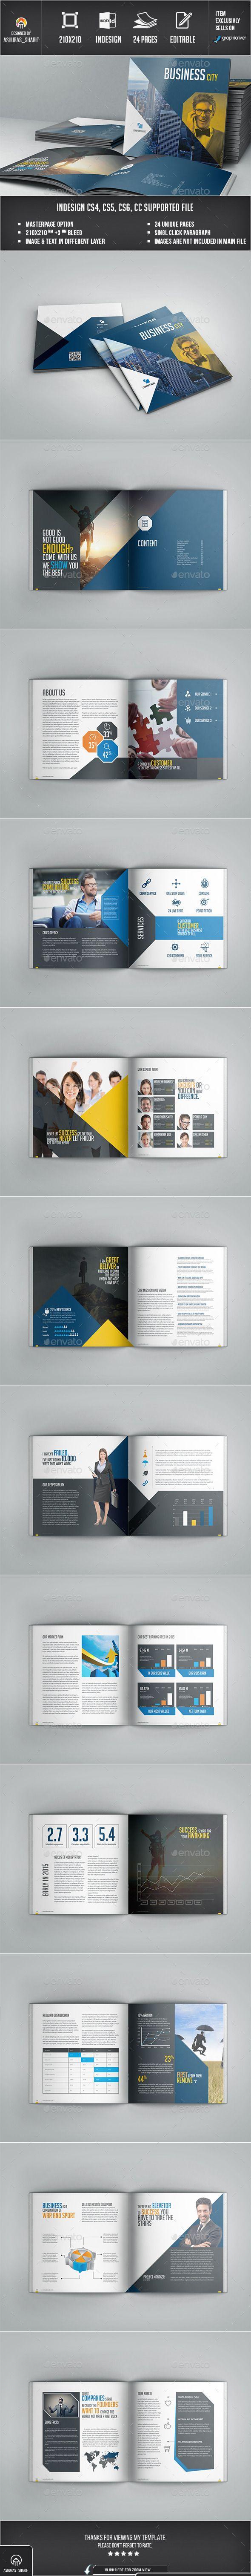 Corporate Square Brochure Template #design Download: http://graphicriver.net/item/corporate-square-brochure/12425179?ref=ksioks